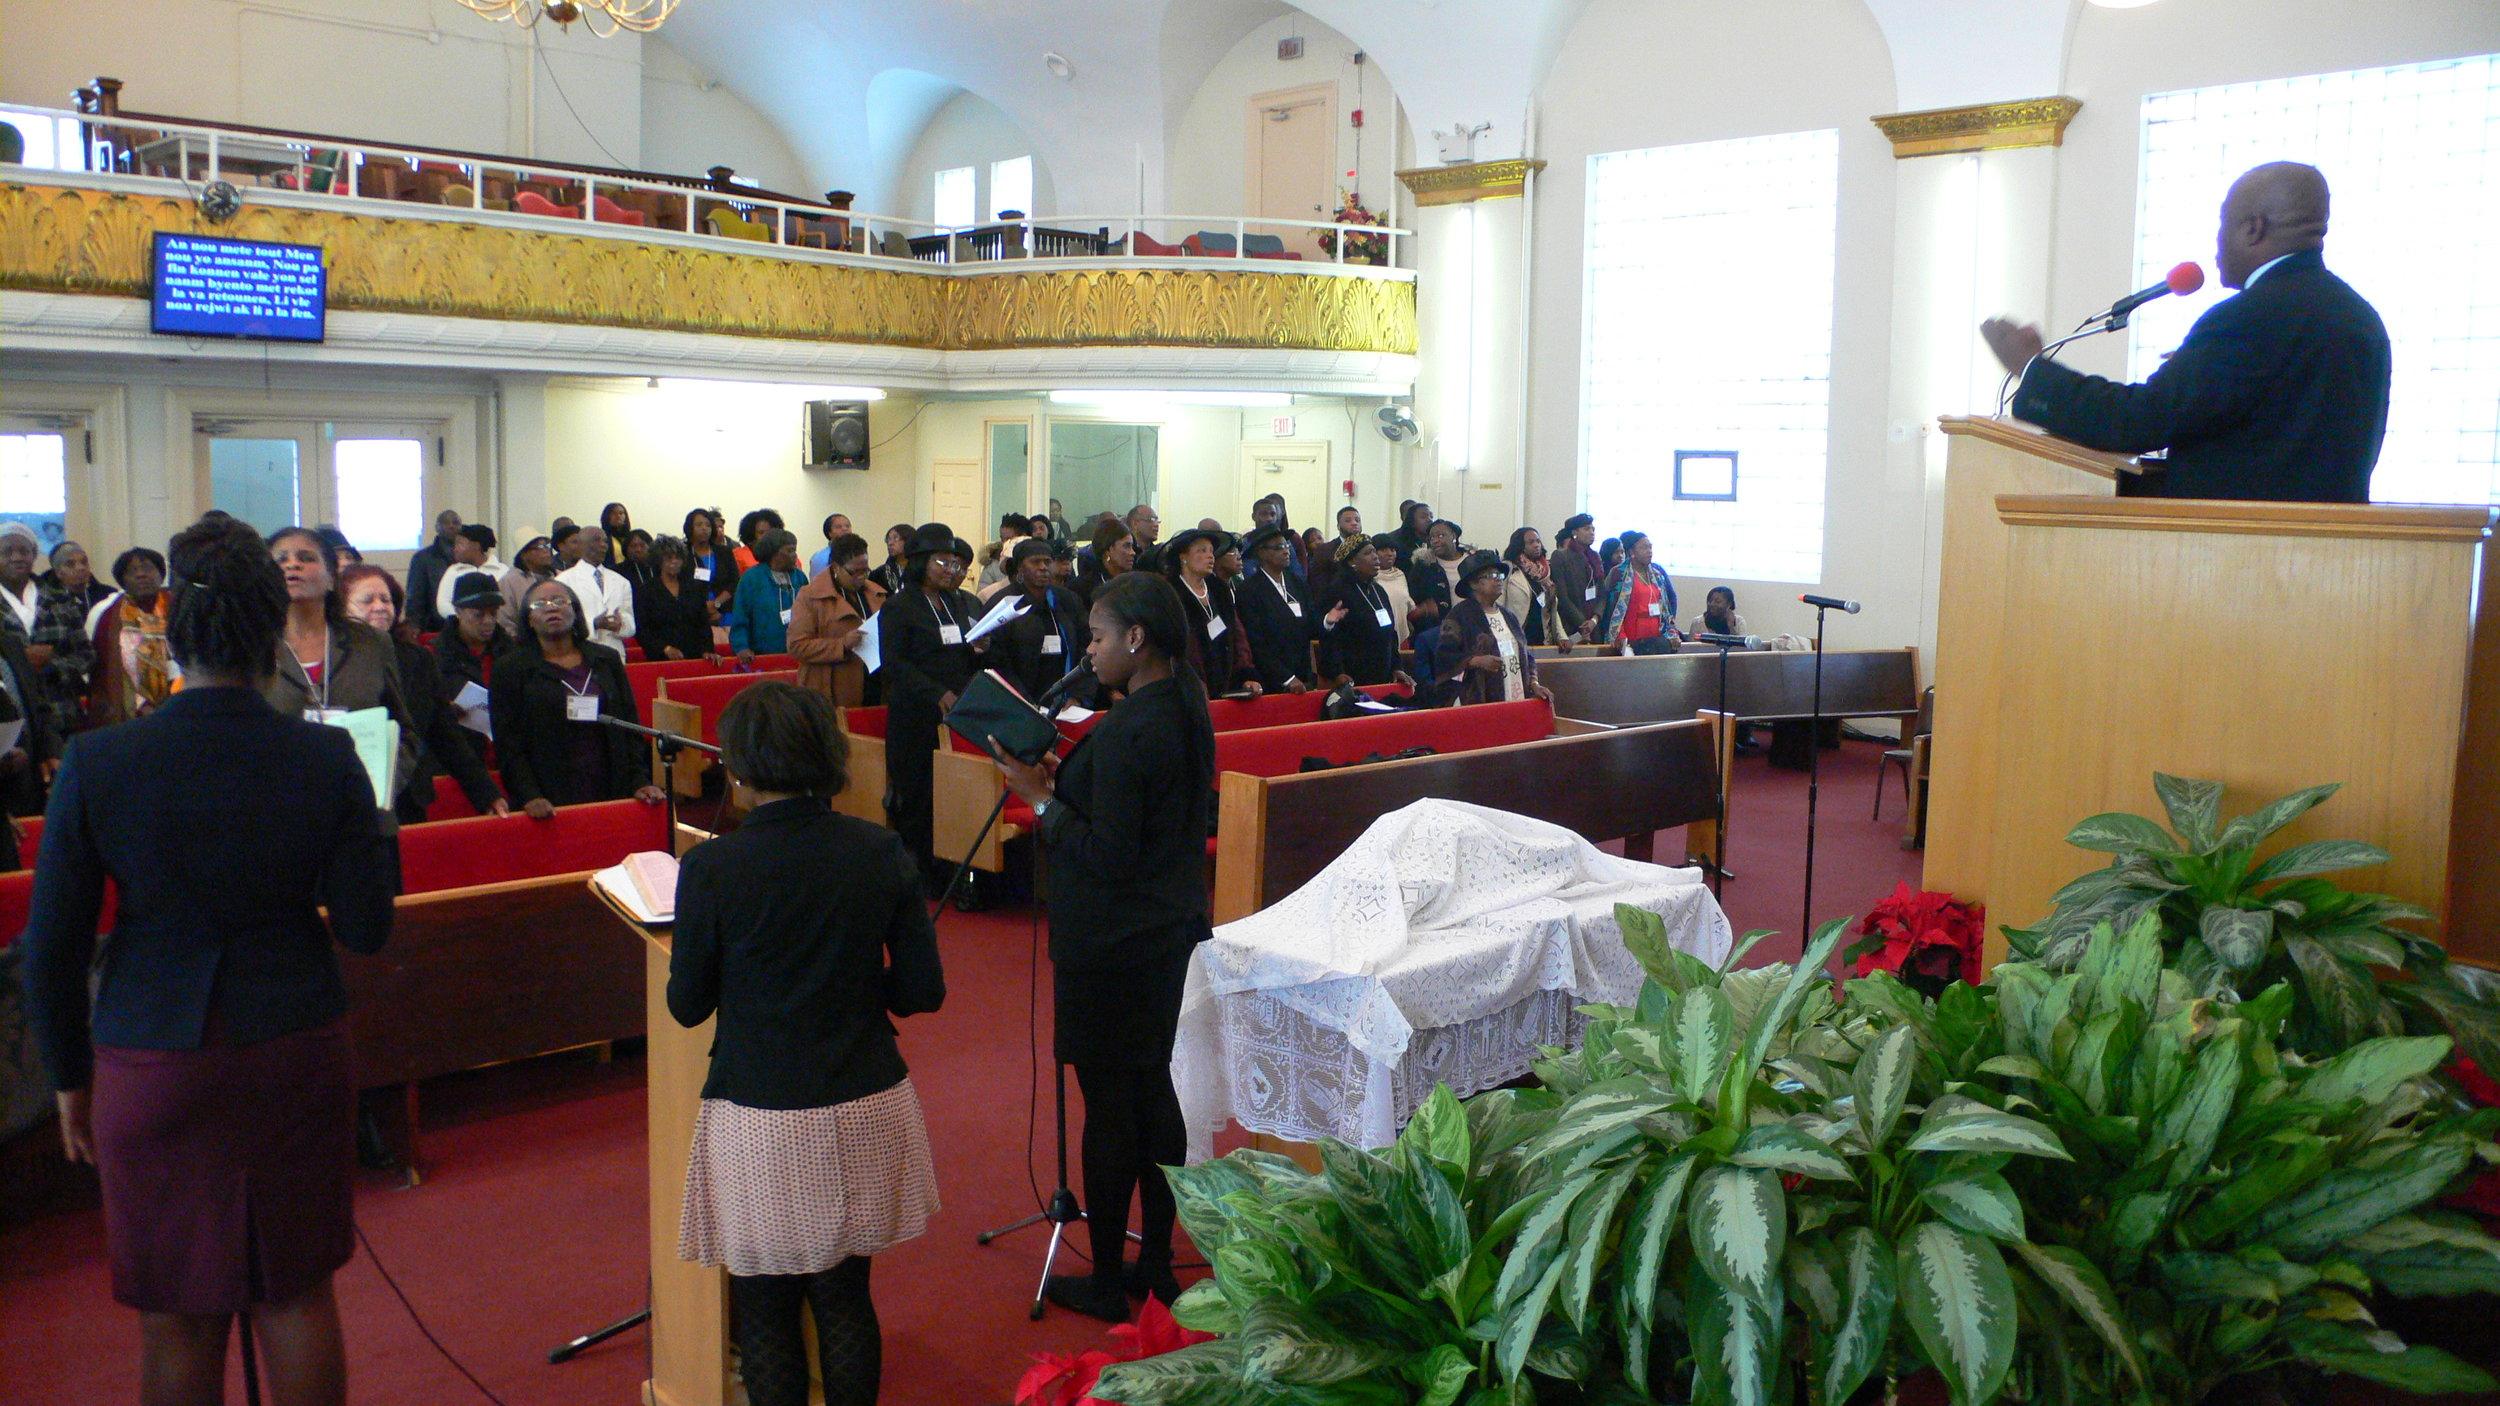 2013-11-30 Haitian Alliance 1